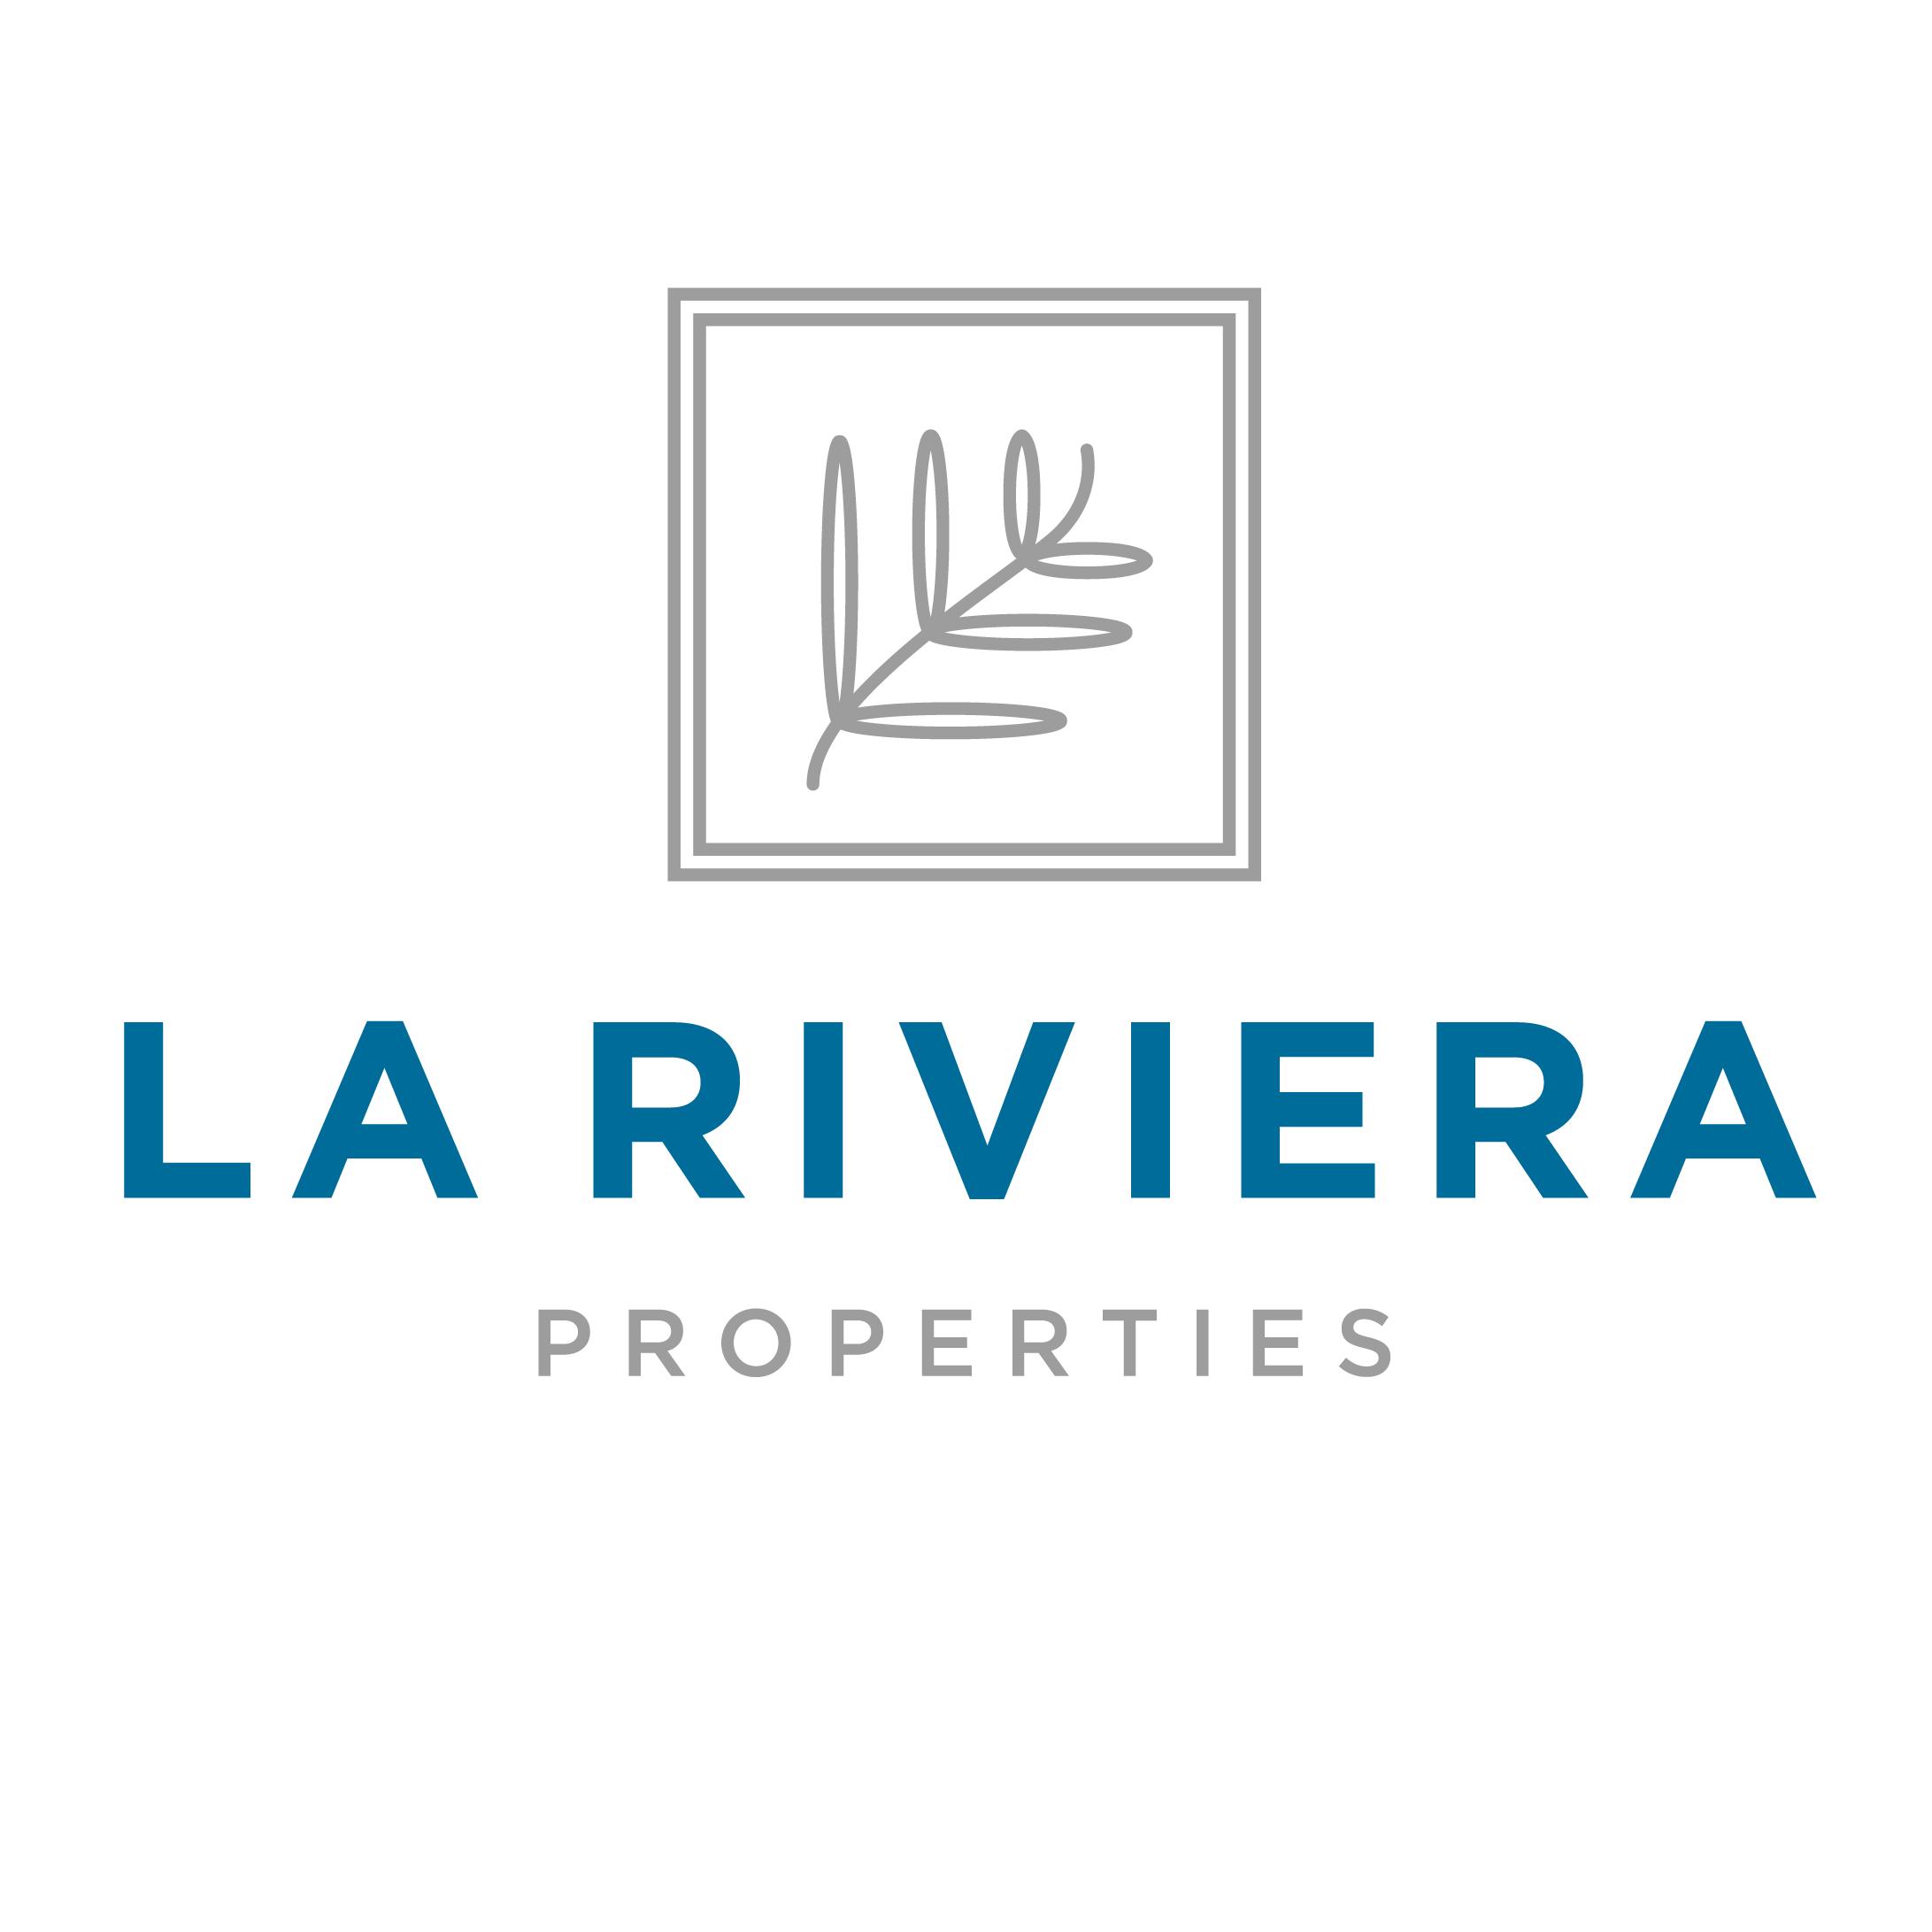 La Riviera Properties